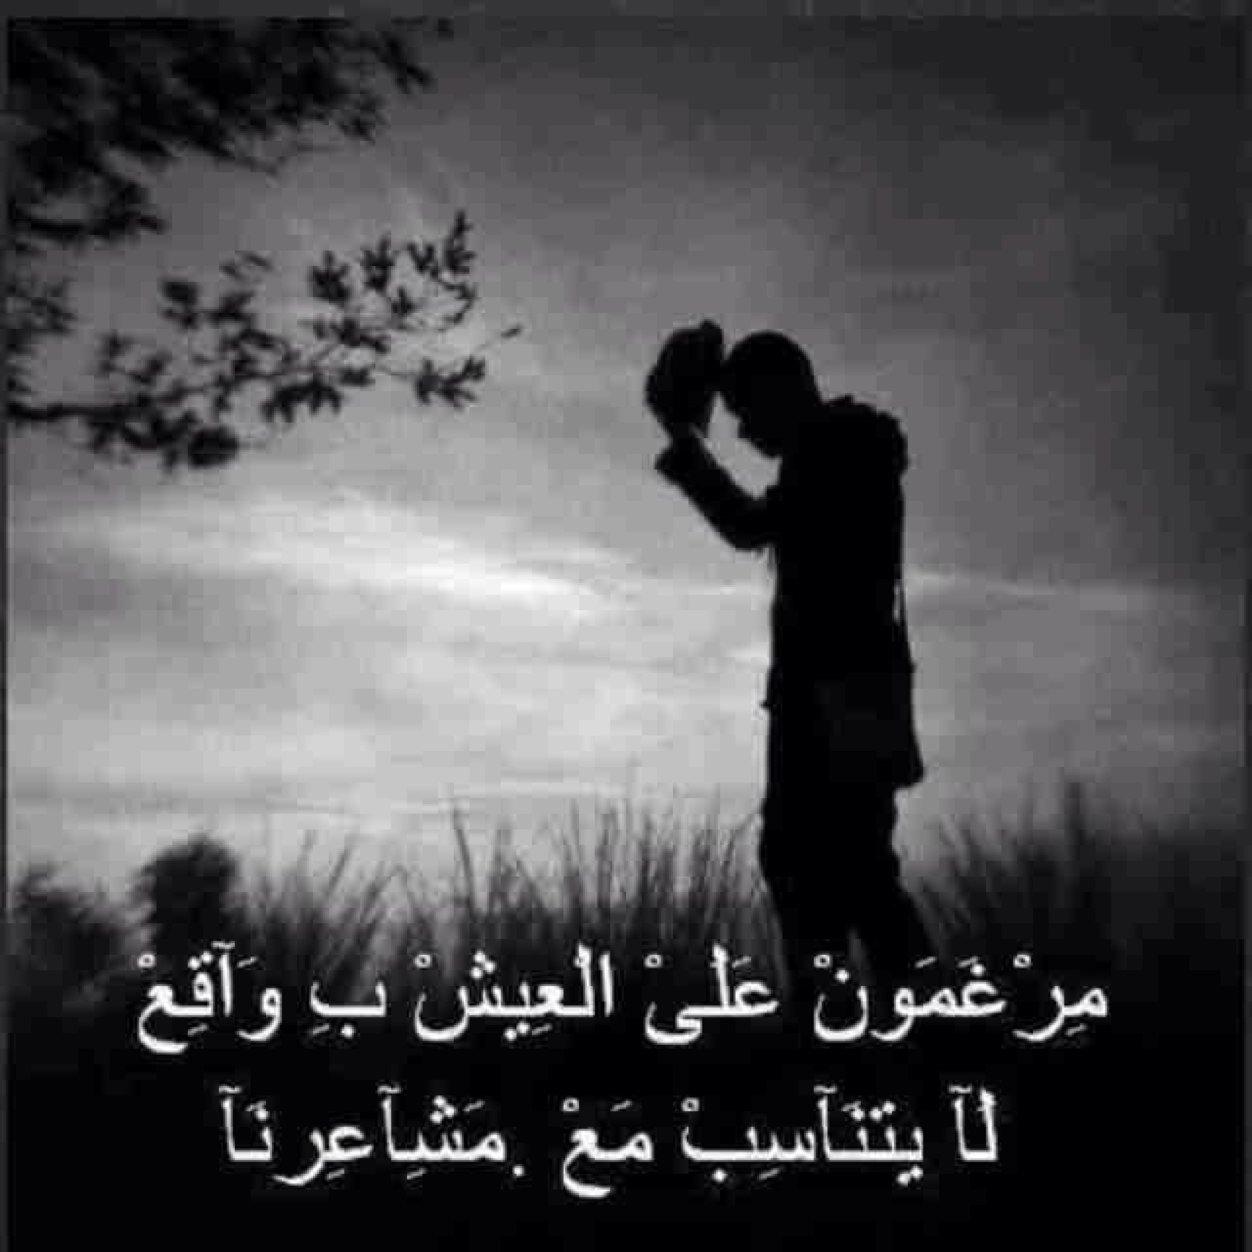 خواطر حب حزينه قصيره جدا 3